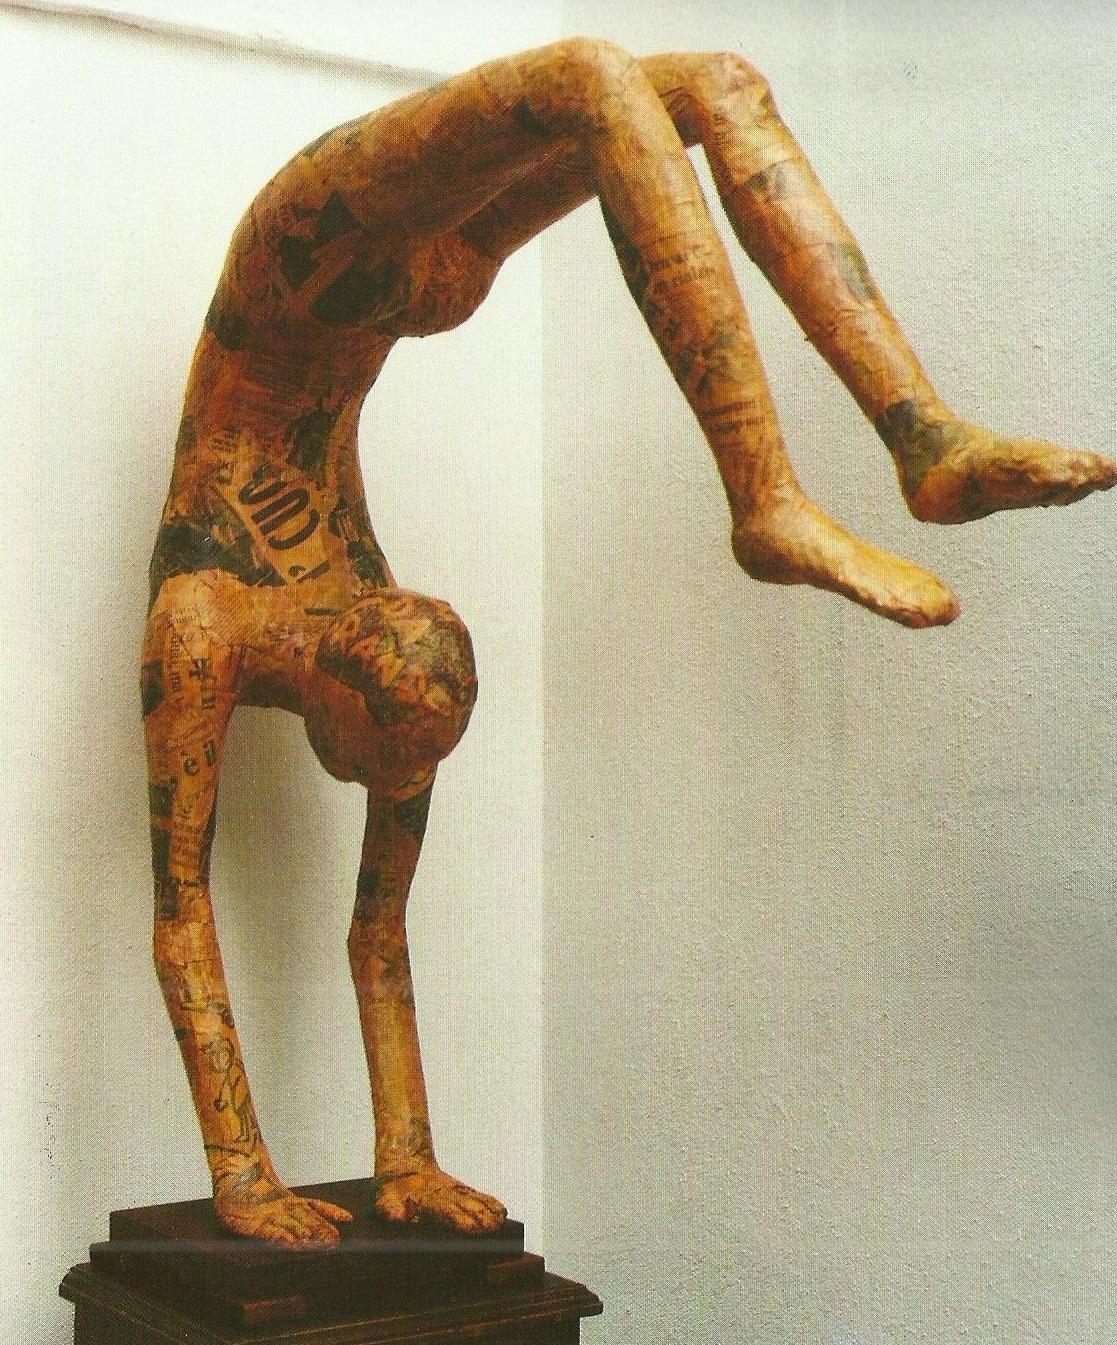 L'equilibrista (carta e ferro, 1989)